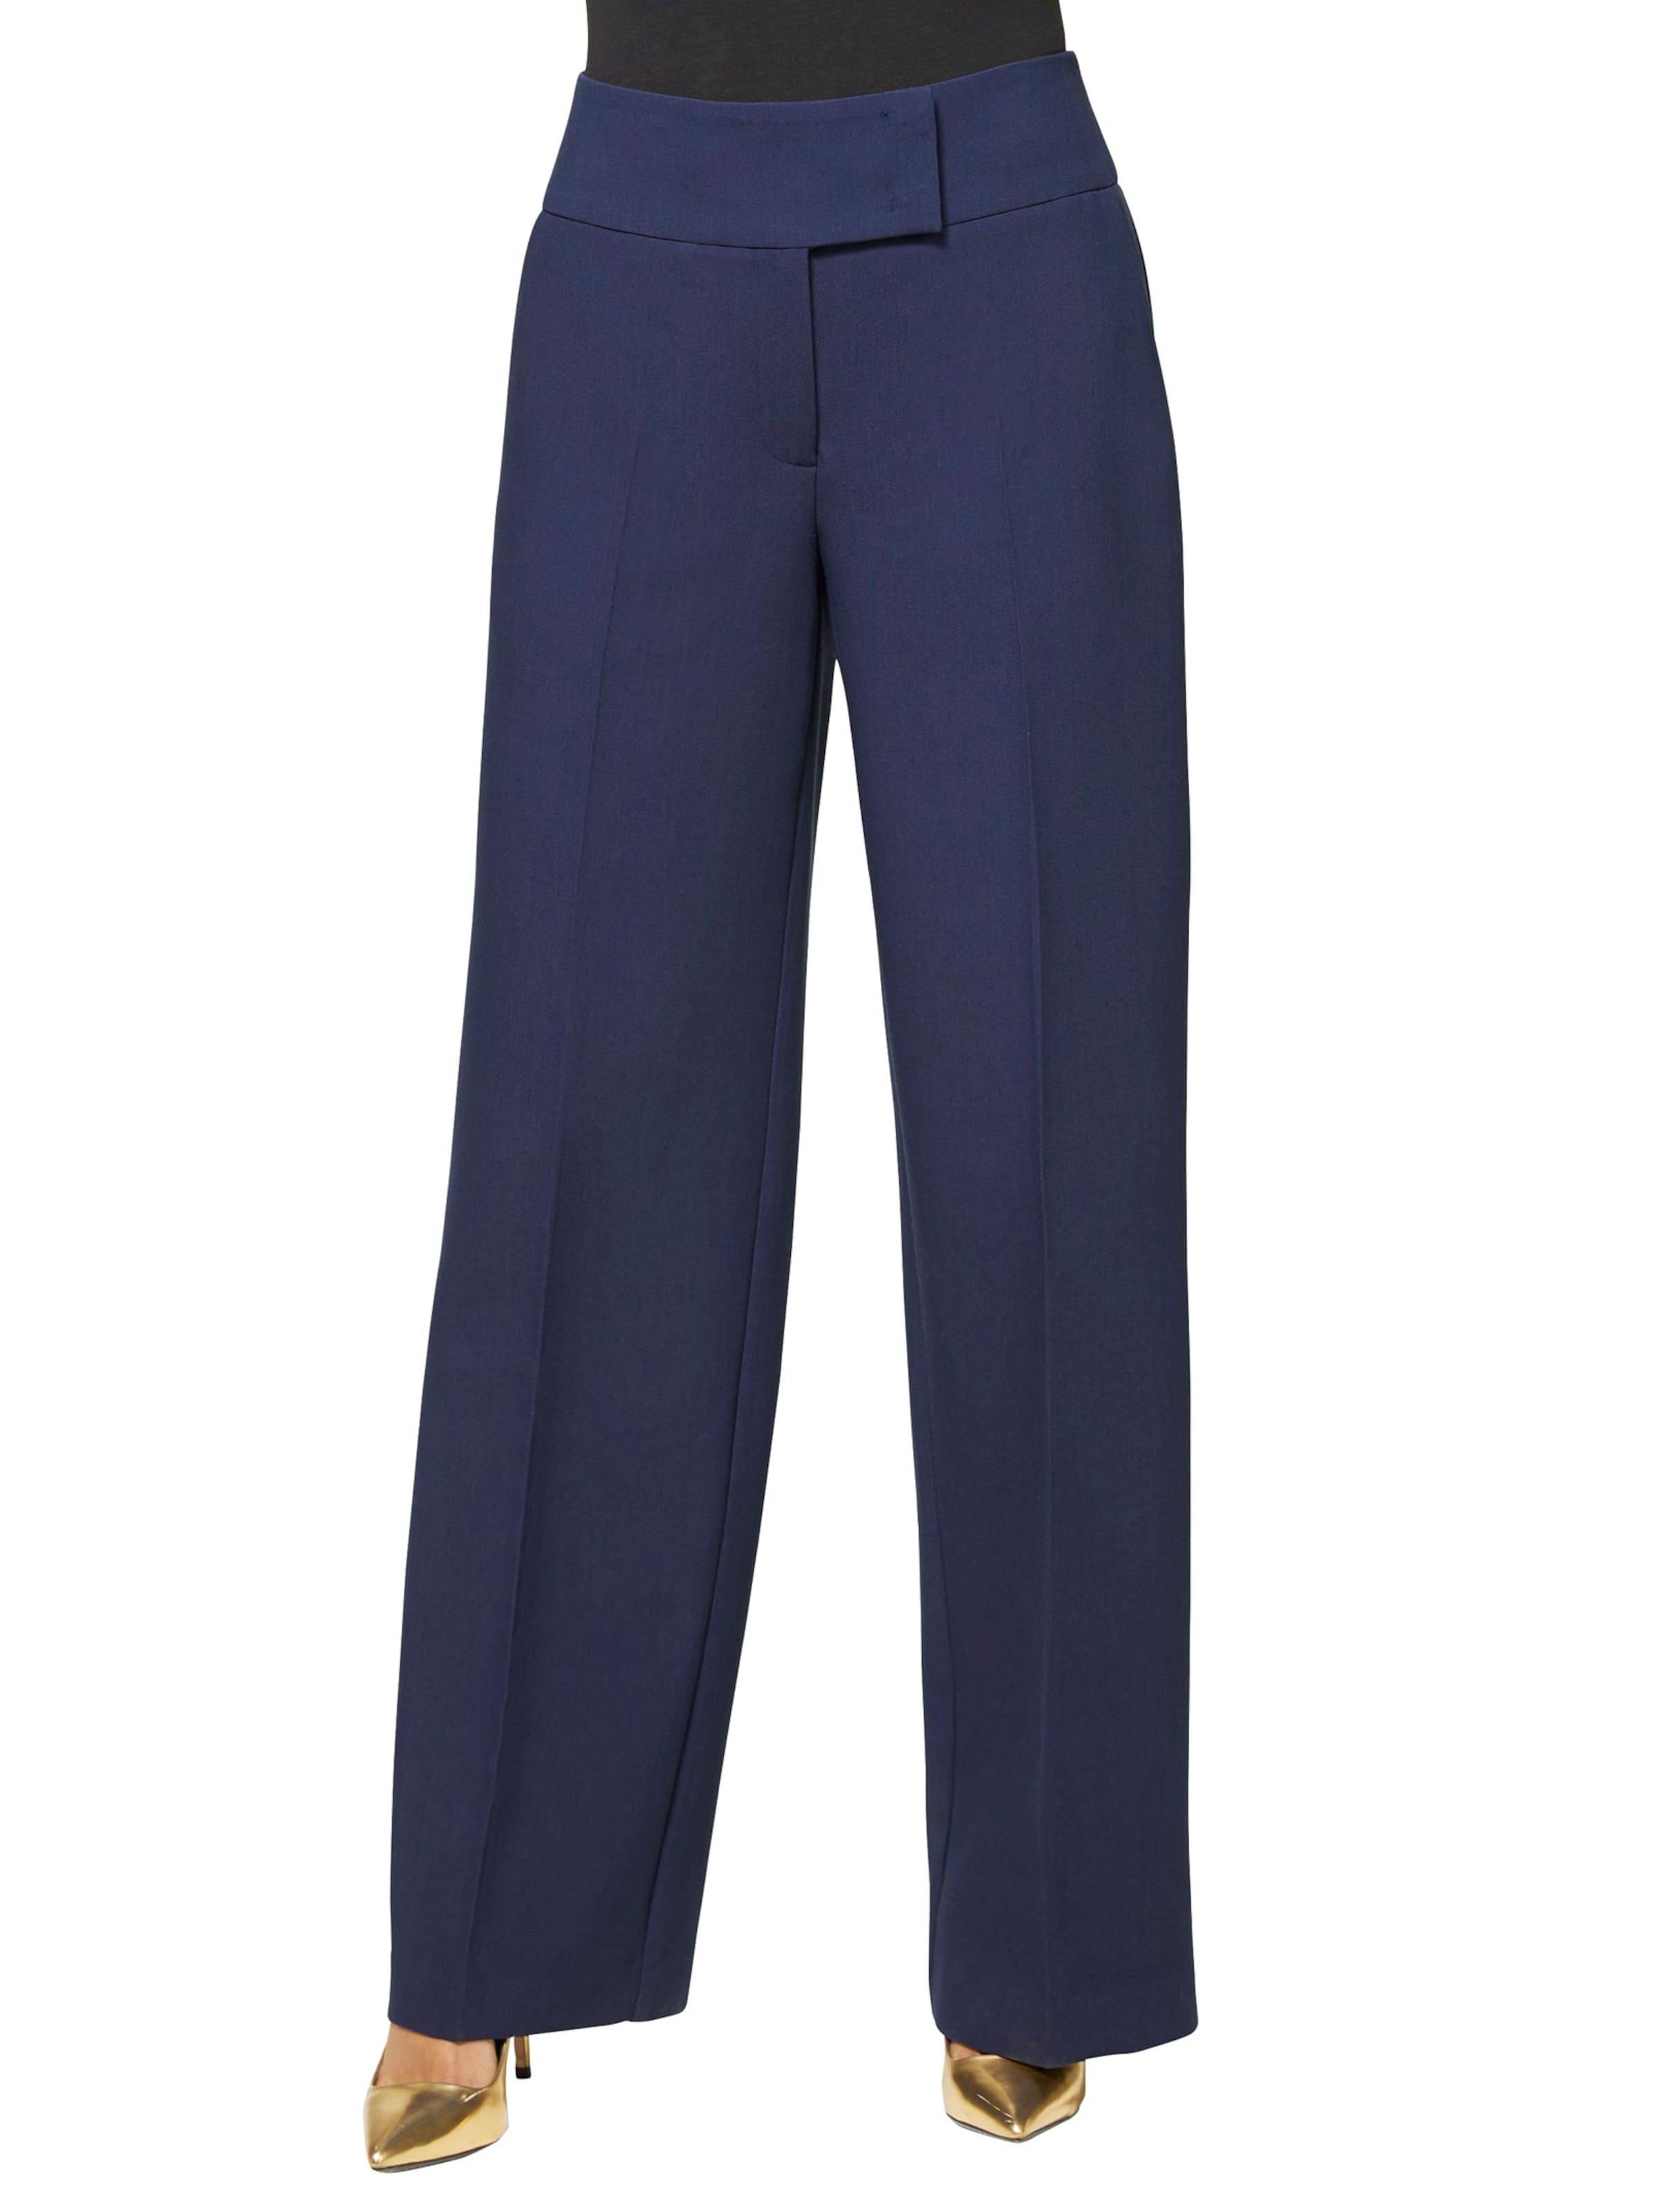 witt weiden -  Damen Hose nachtblau